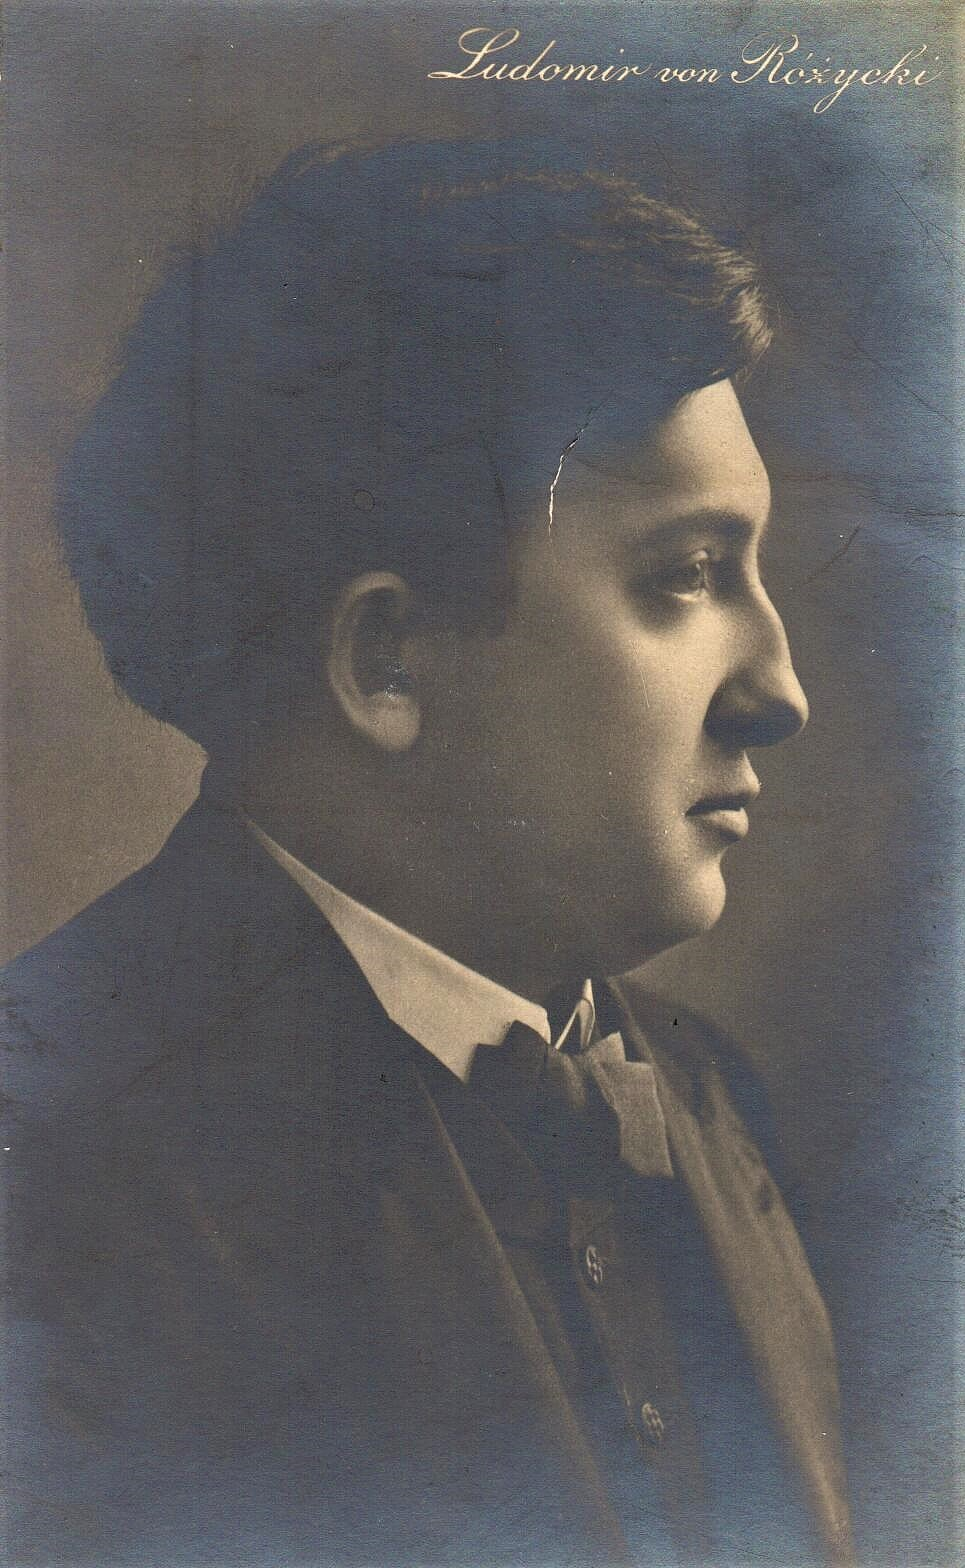 Rozycki-ca-1910_PMC-Collection-135258.jpg